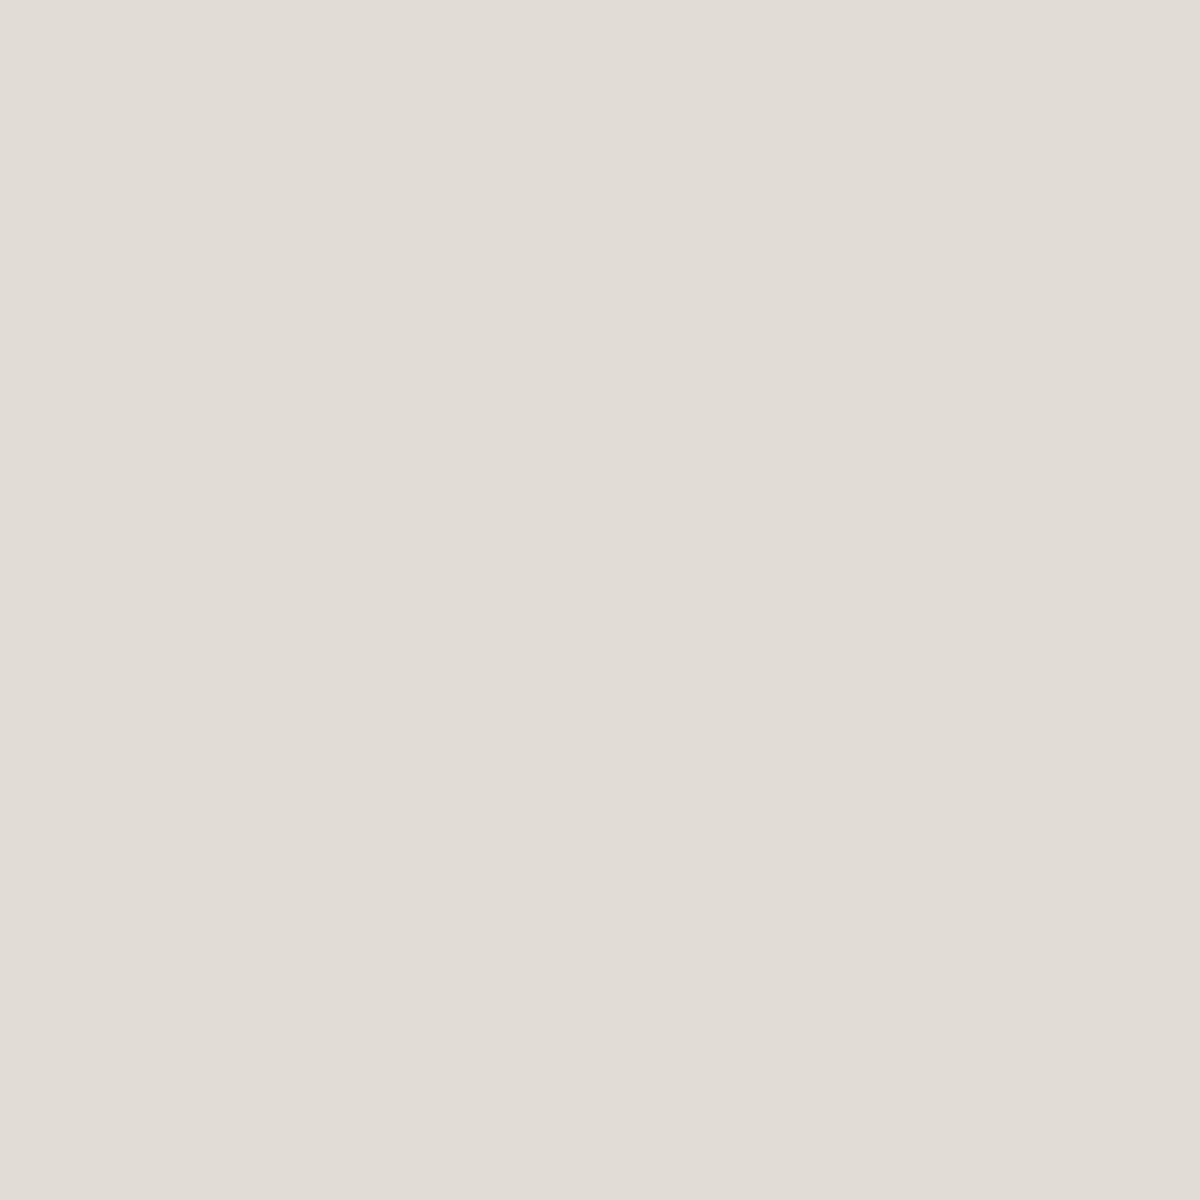 Ironworks Radiators Inc. farrow and ball comforth white paint finish